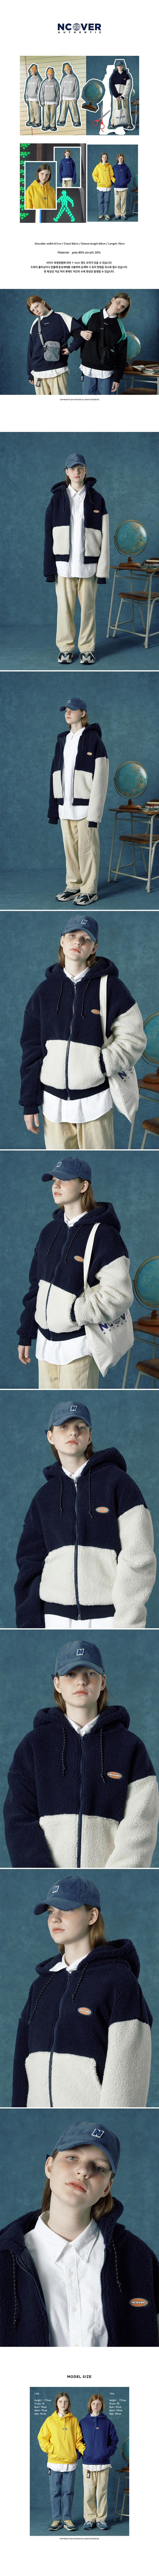 Ncover fleece hoodie zipup-navy.jpg